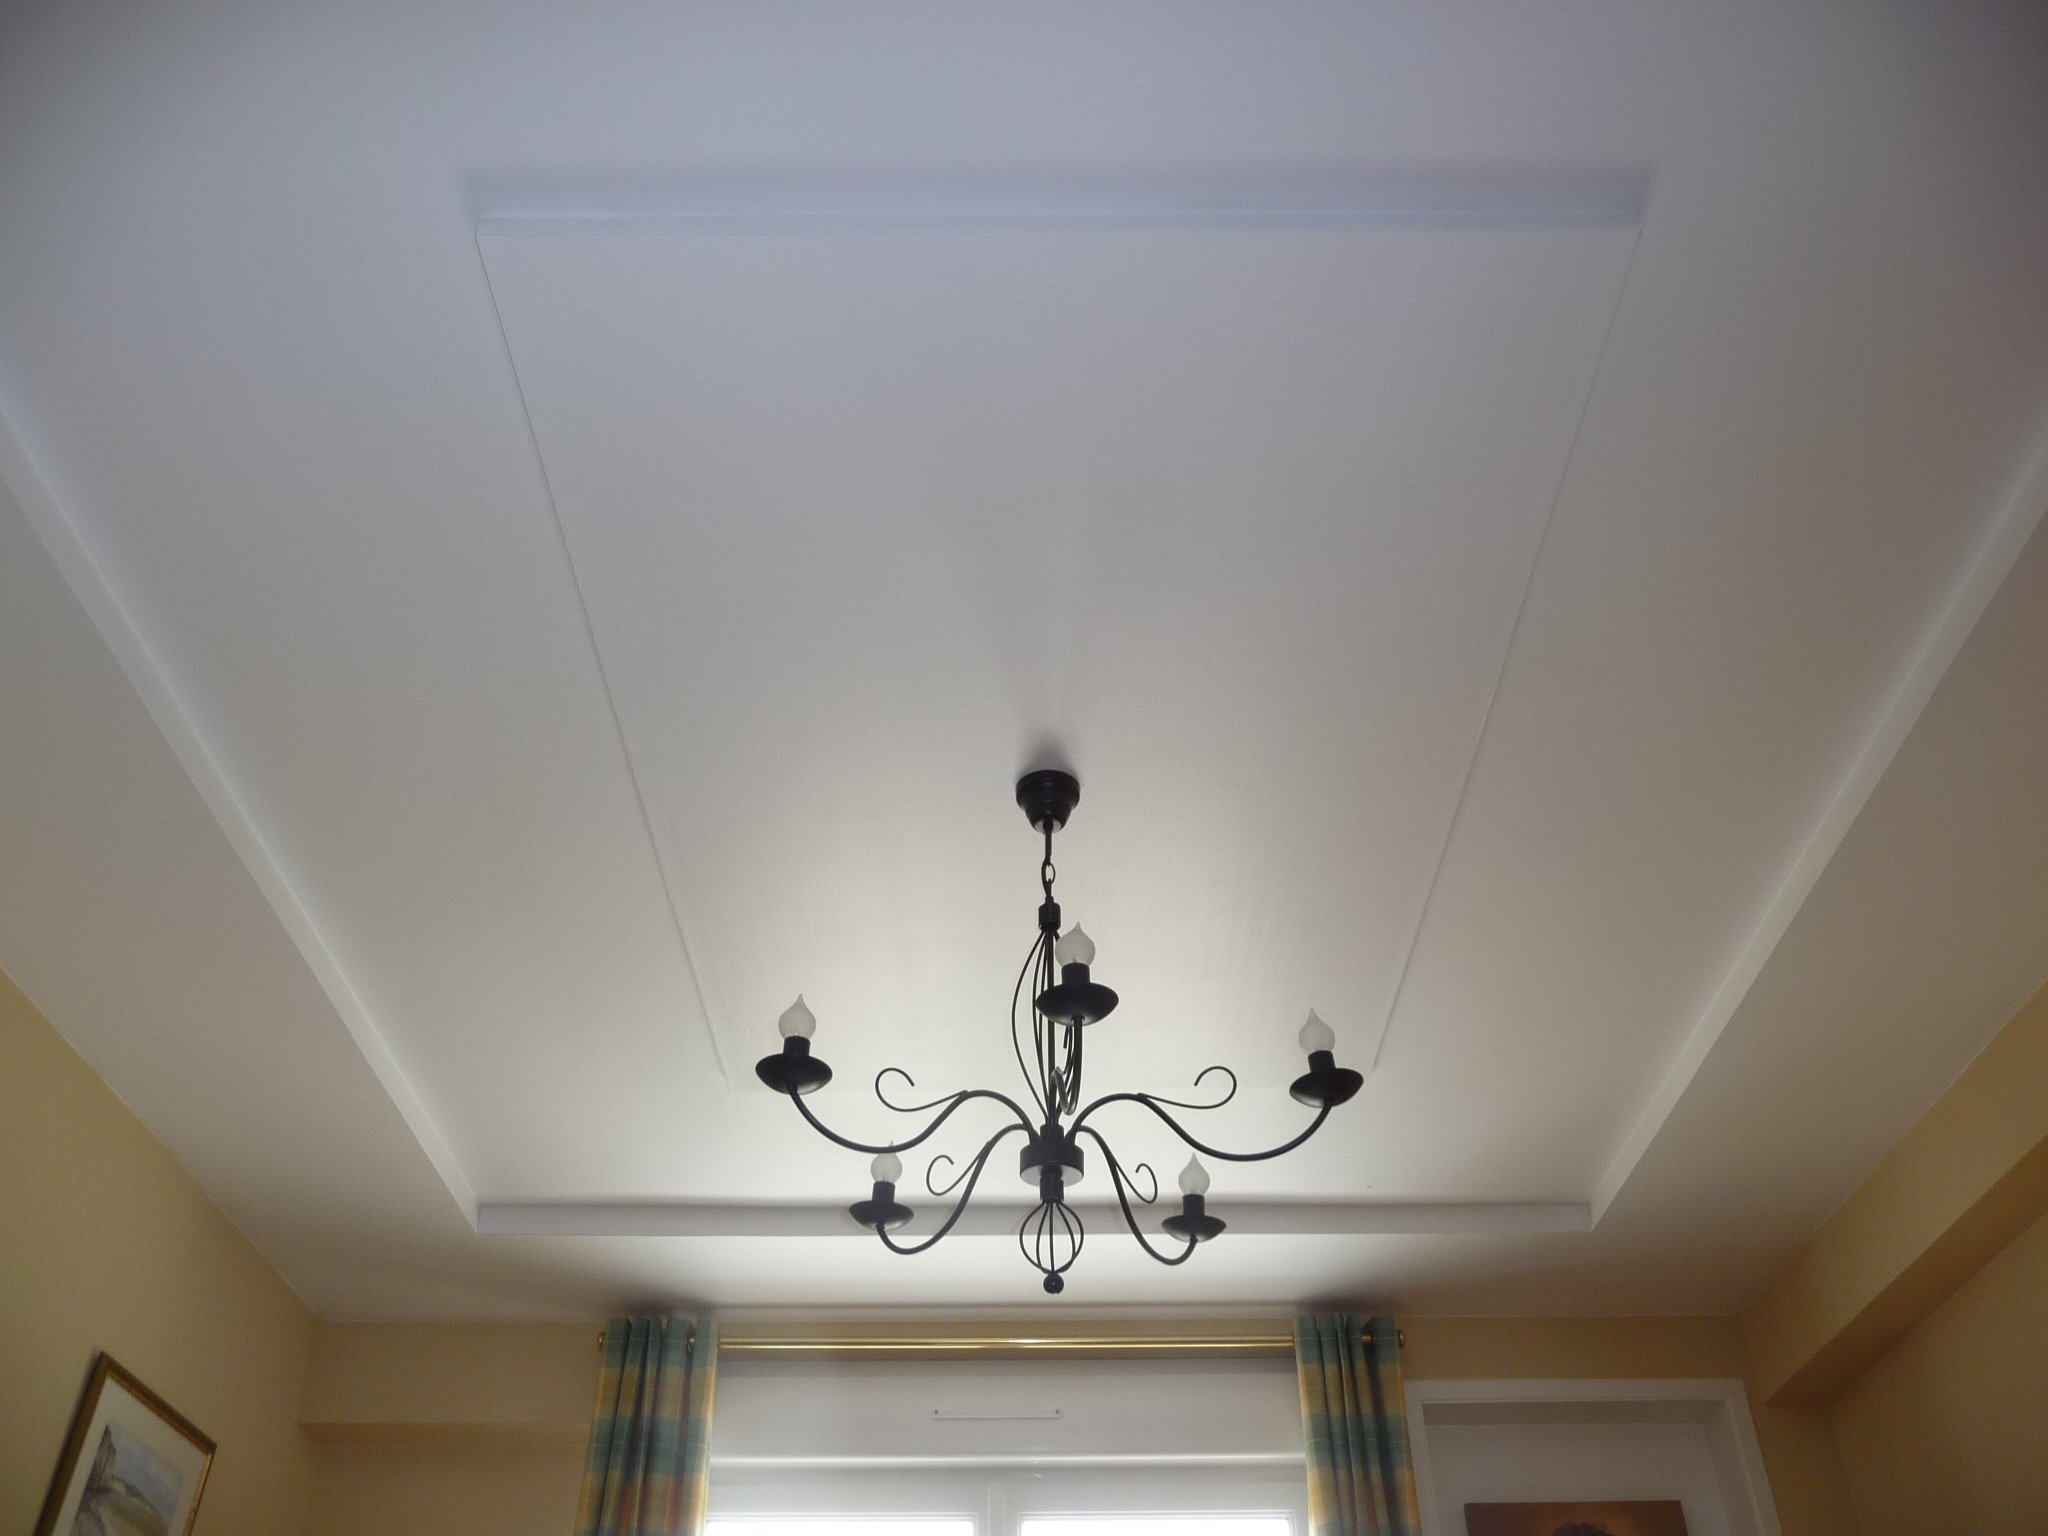 Faux plafond sur poutrelle hourdis polystyrene aix en provence service trav - Renovation plafond dalle polystyrene ...